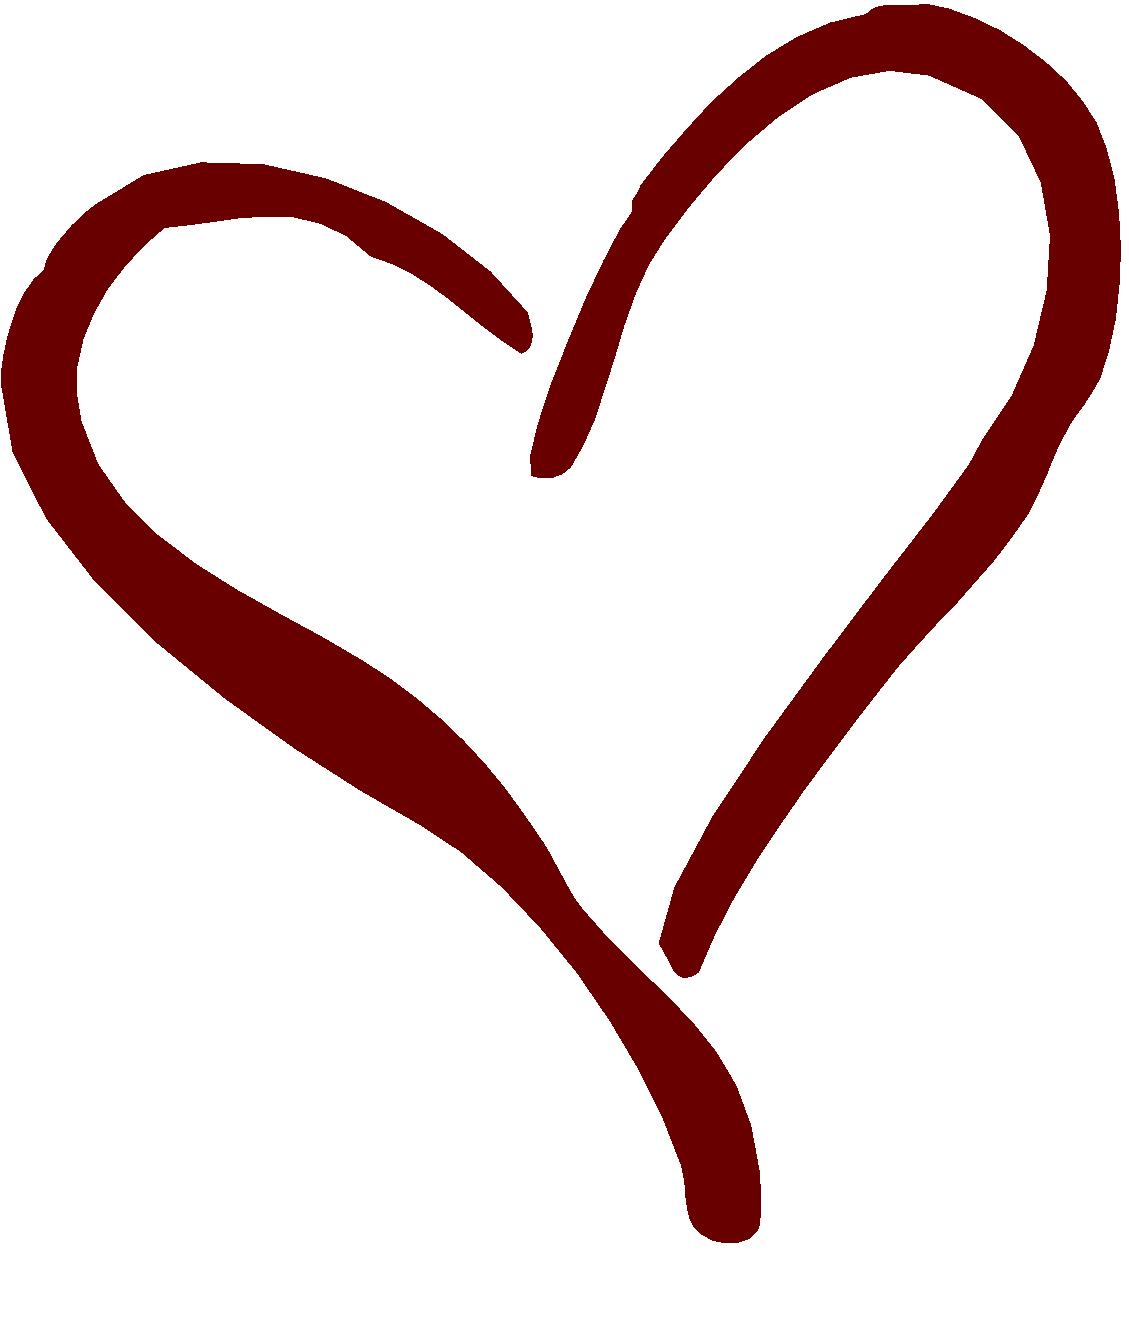 Line Art Heart Shape : Clipart heart outline panda free images